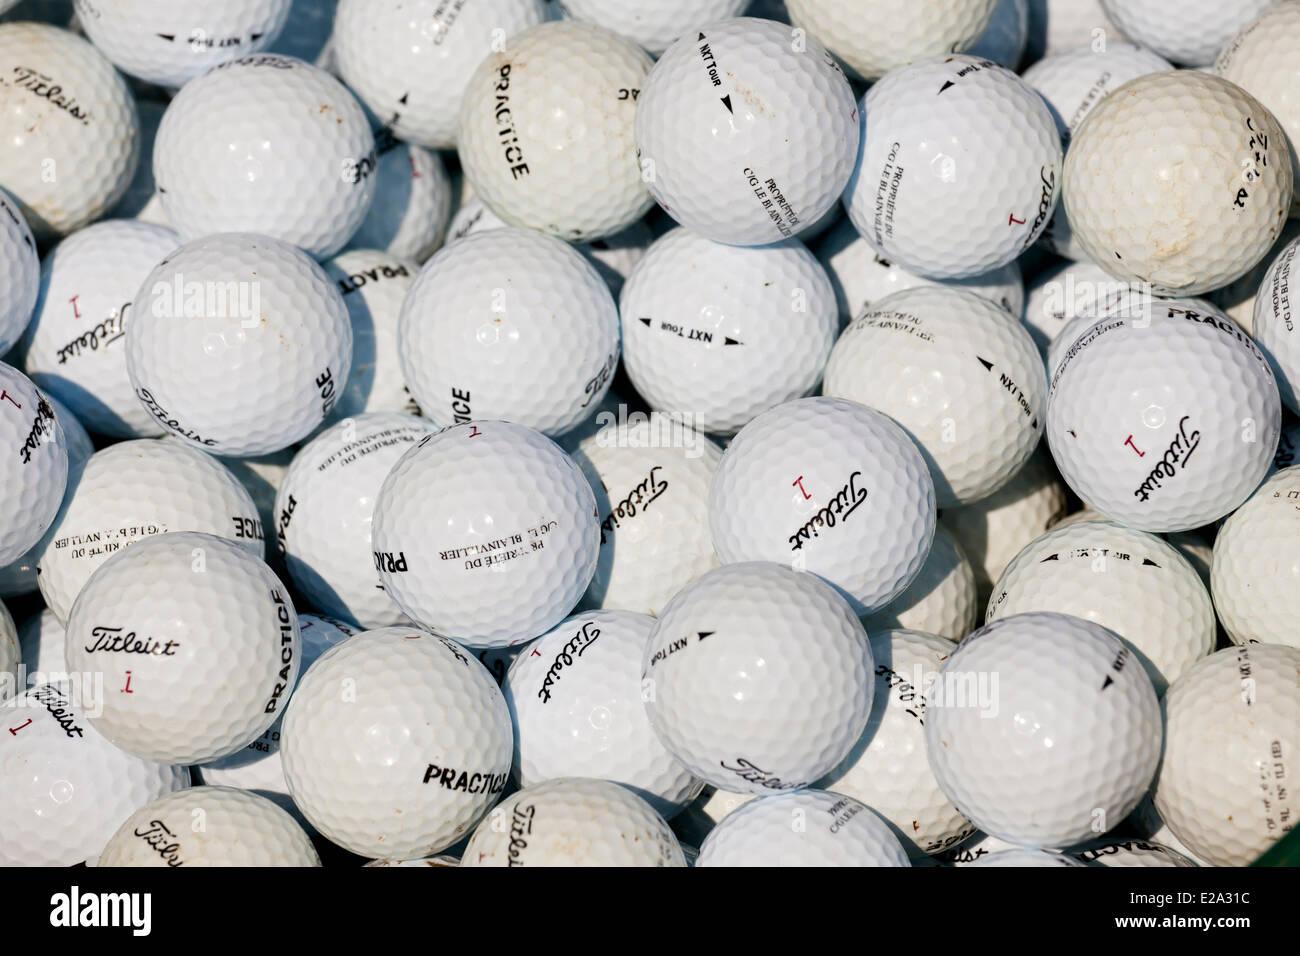 Canada, Quebec Province, golf balls - Stock Image